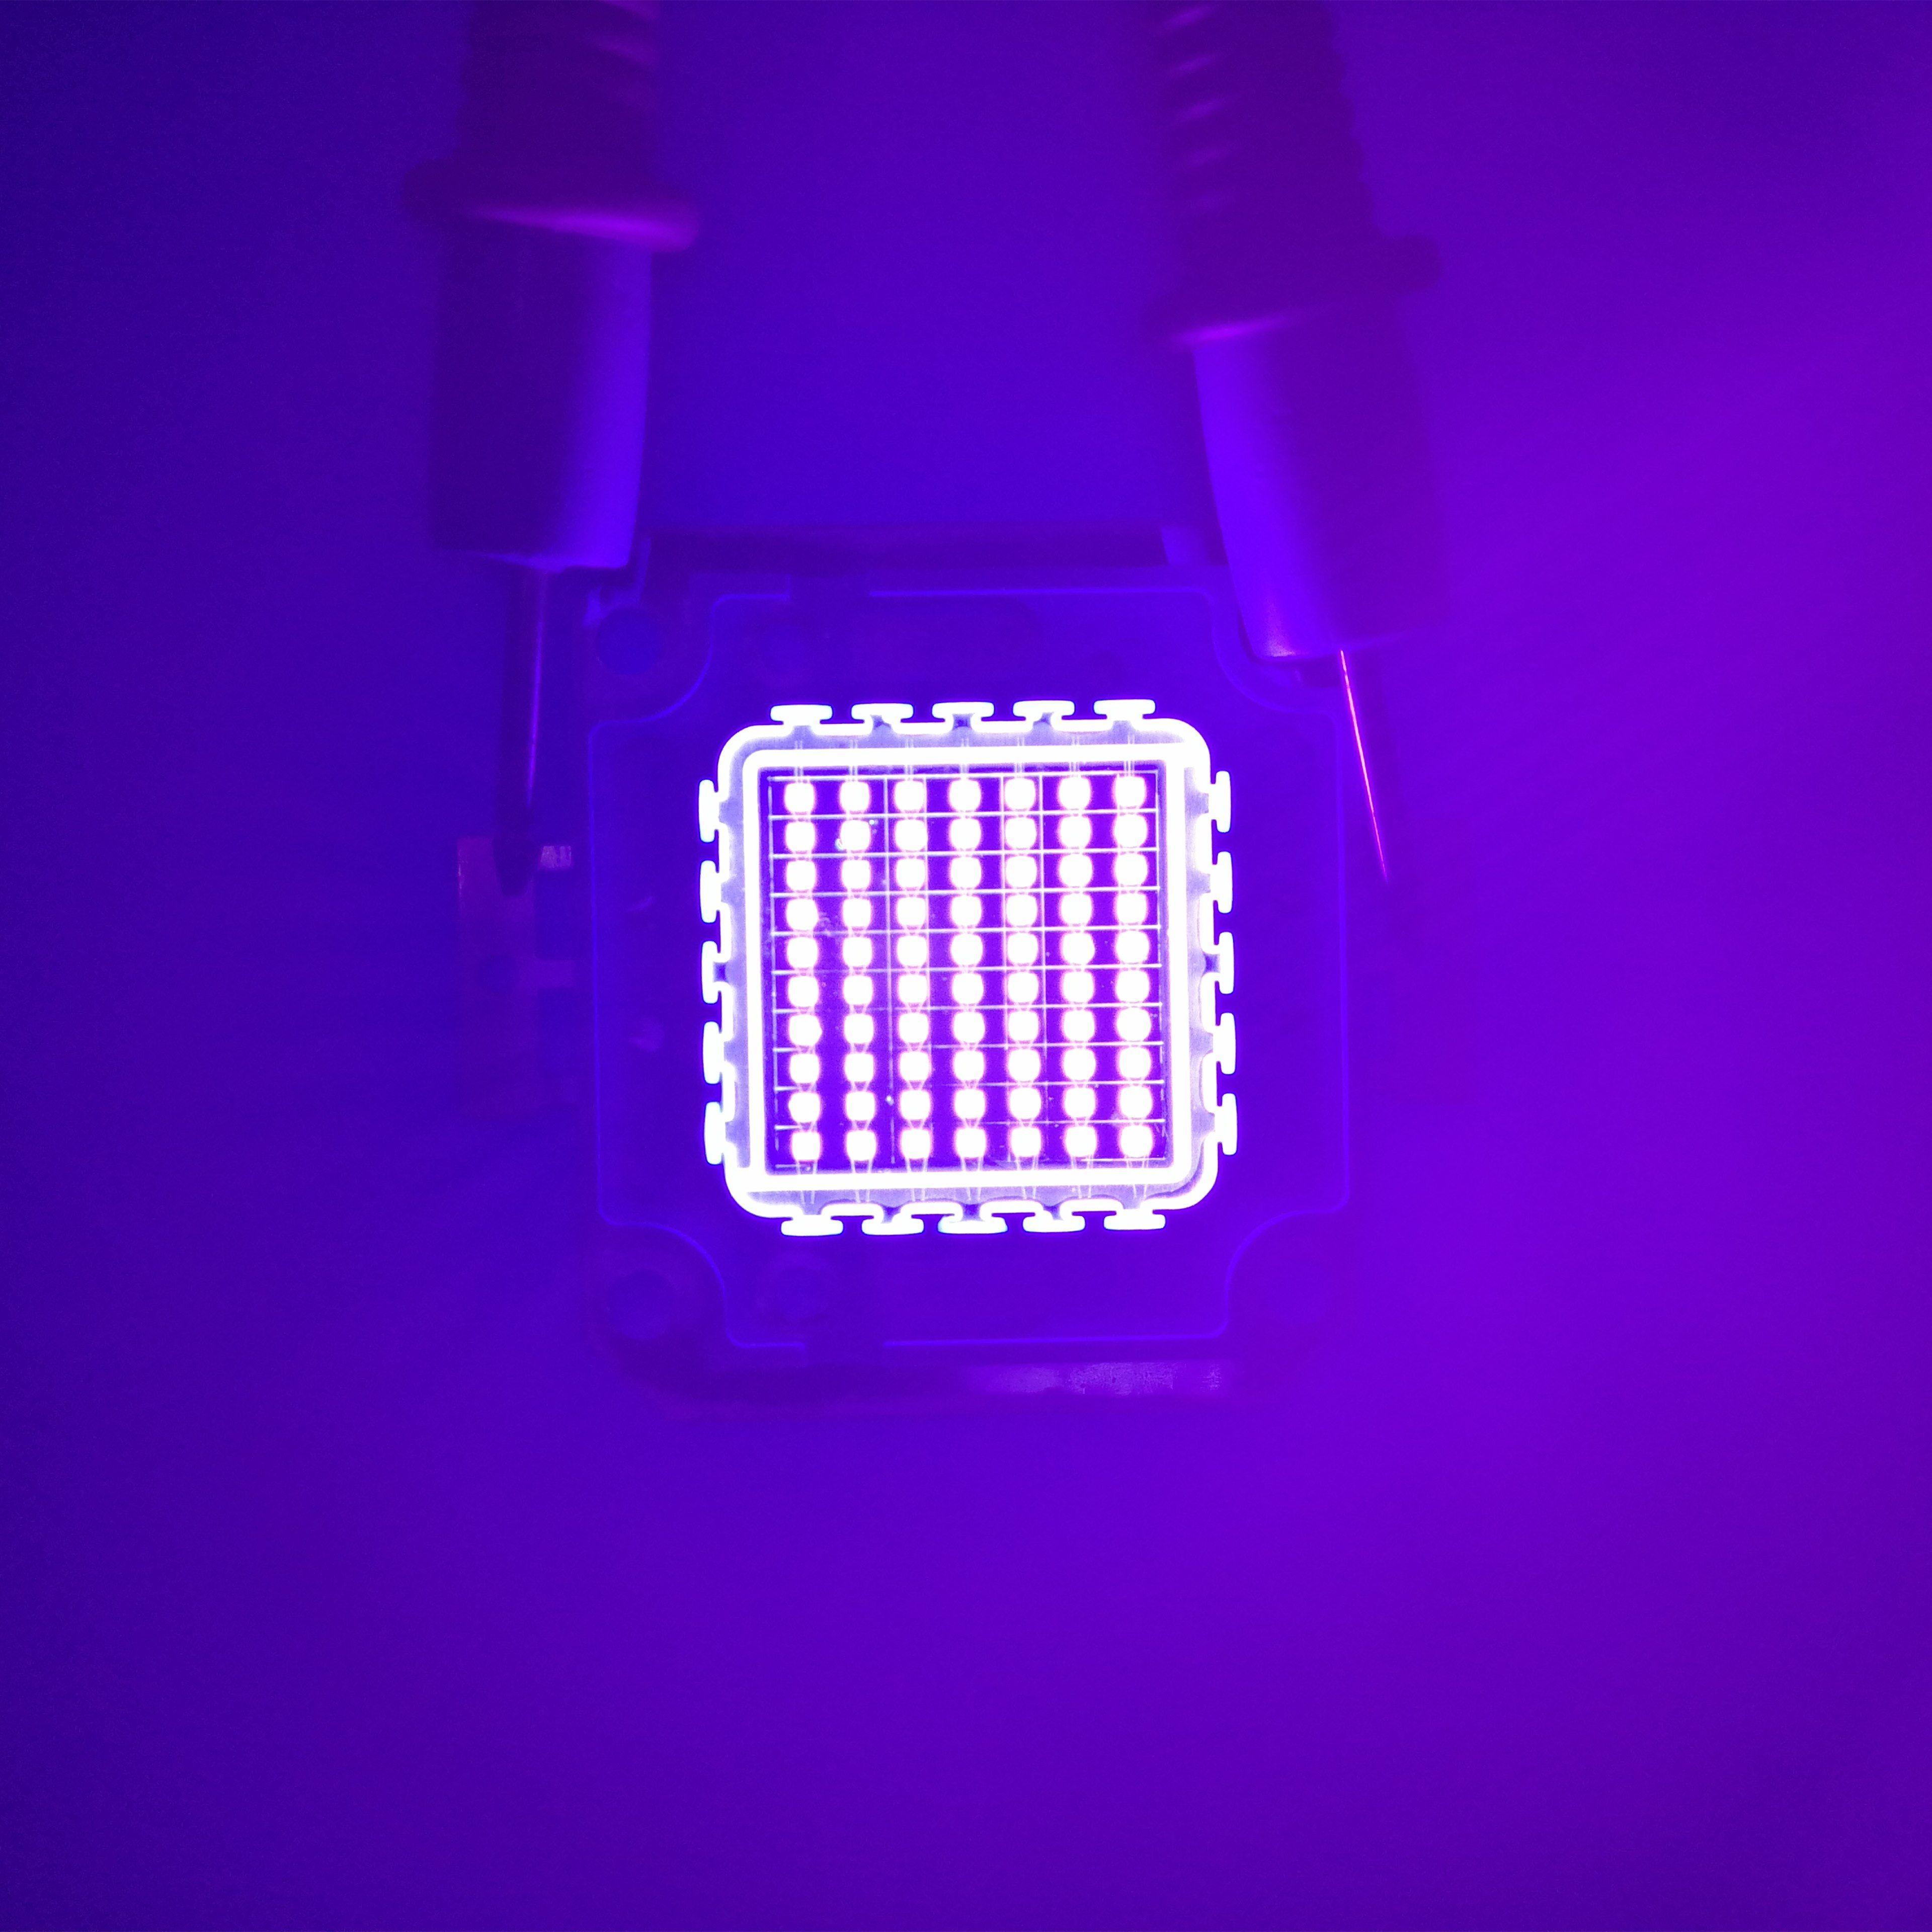 10w 30w 50w 100w UV-LED-Licht 45mil Ultra Violet High-Power LED-Lampe UV 365nm 375nm 385nm 395nm 405nm LED Ultra Violet Licht Perlen